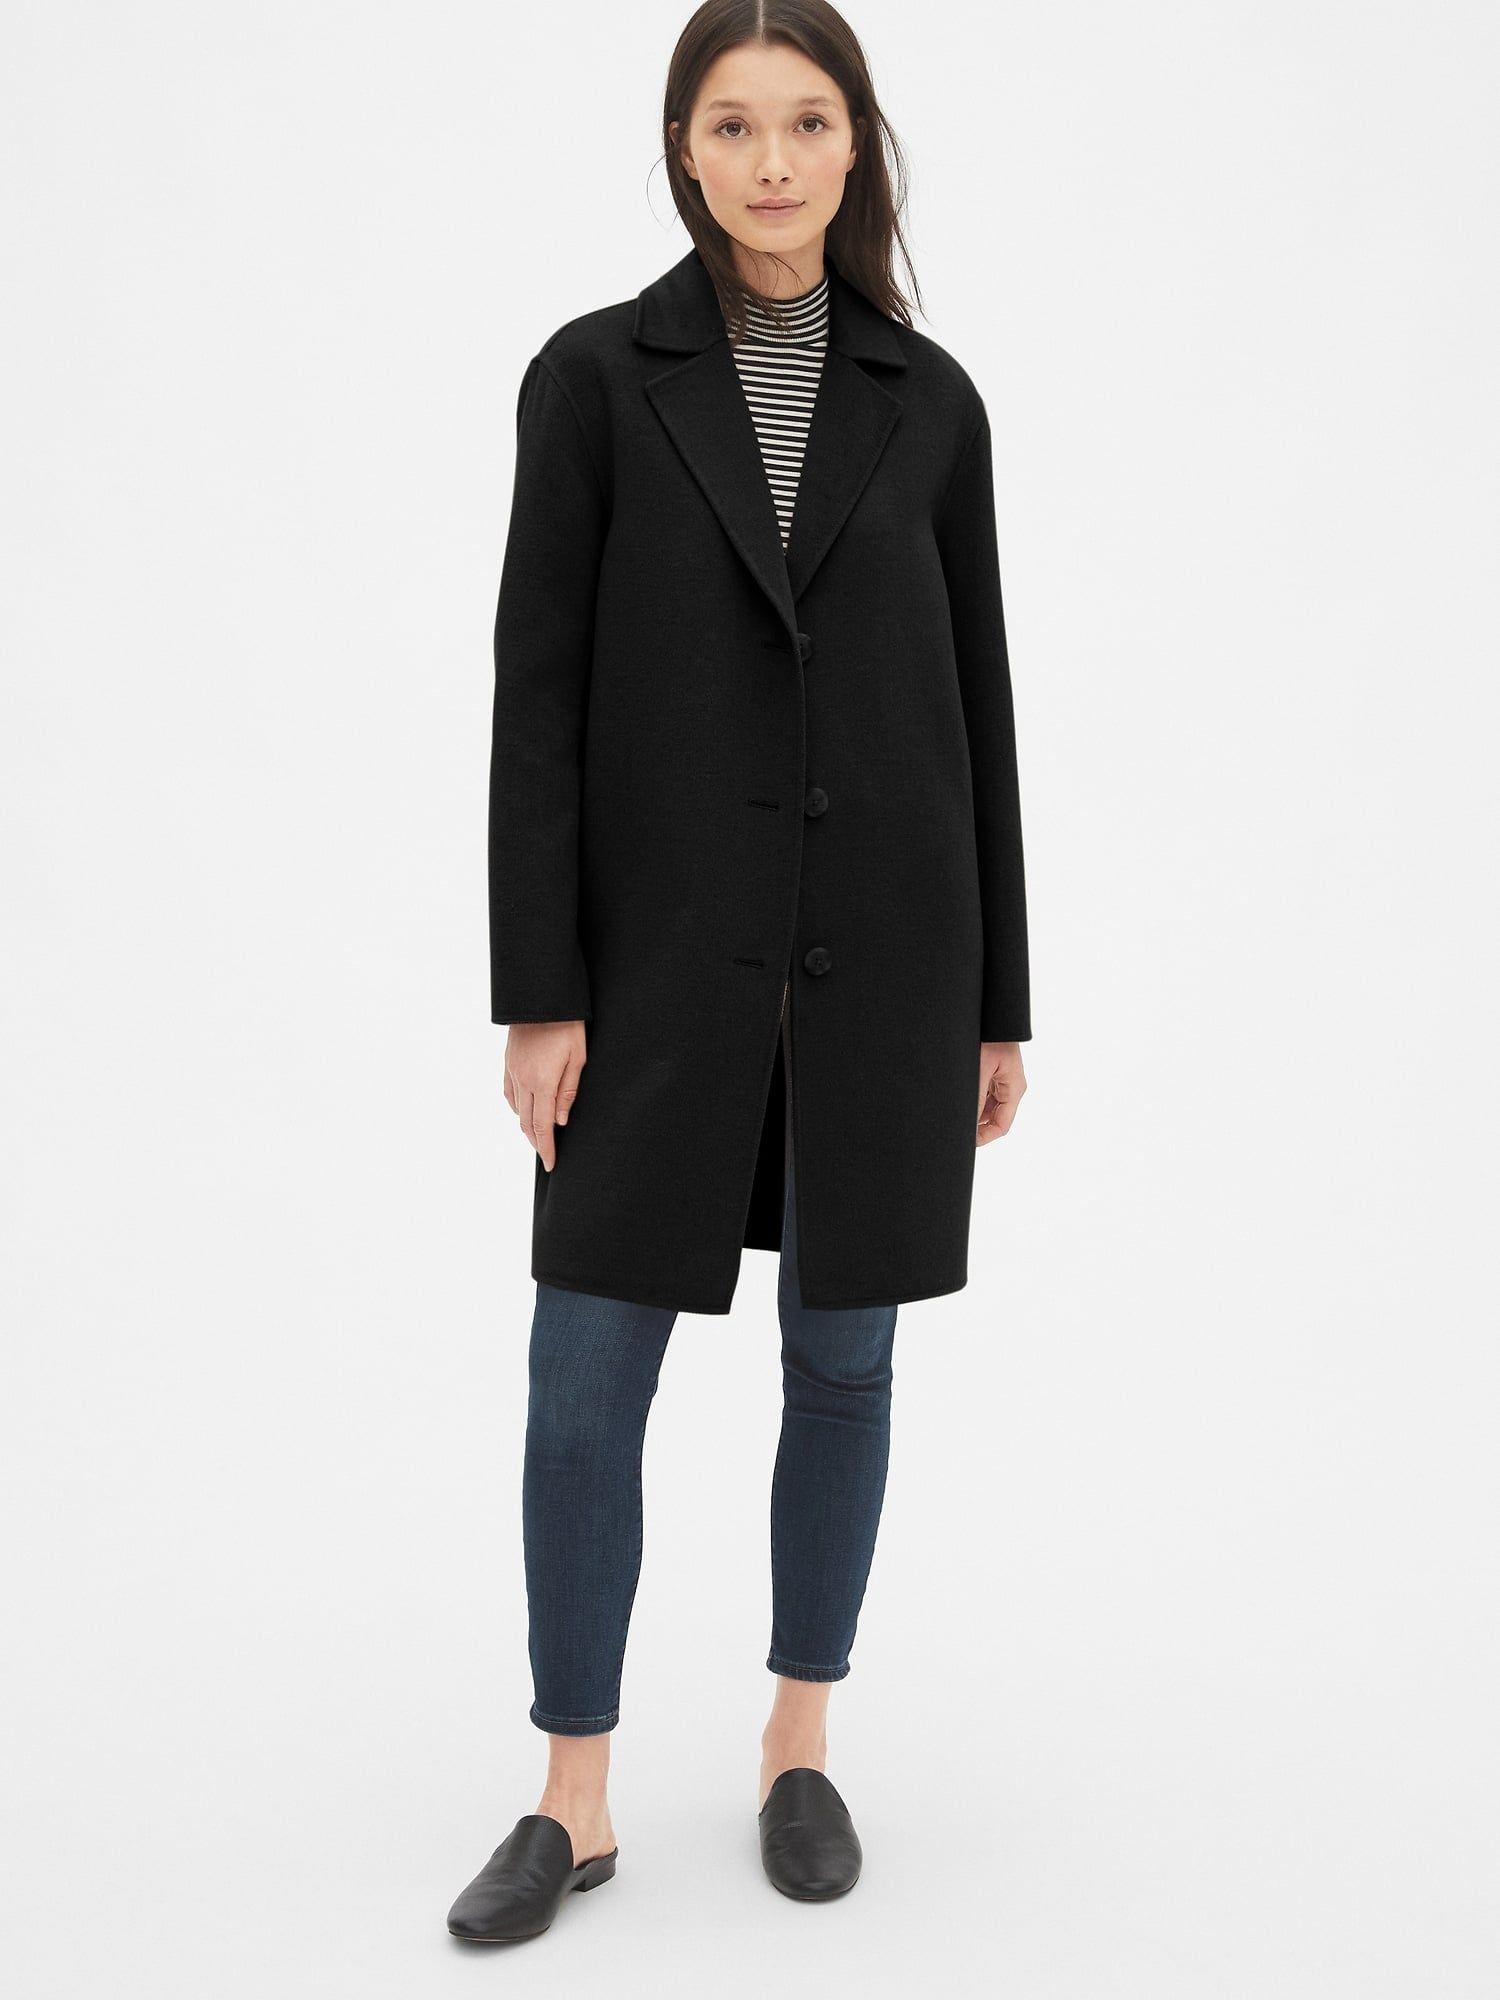 Gap Double Face Wool Blend Coat Car Coat Coat Wool Blend Coat [ 2000 x 1500 Pixel ]